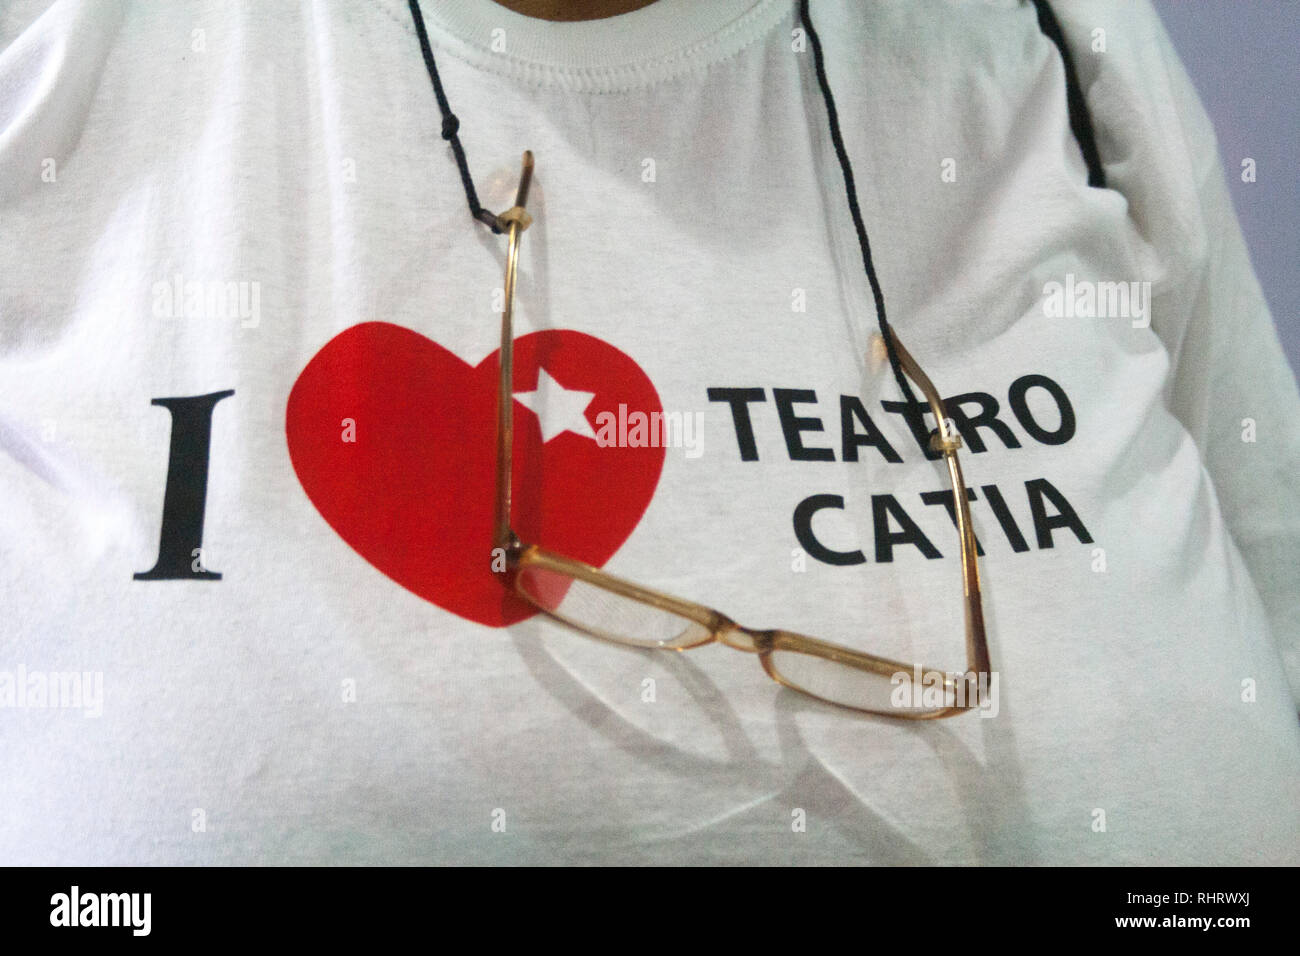 Caracas, Dtto Capital / Venezuela - 03/05/2013. T-Shirt  with message   I love Catia Theater, Catia Theater in Catia neighborhood. - Stock Image